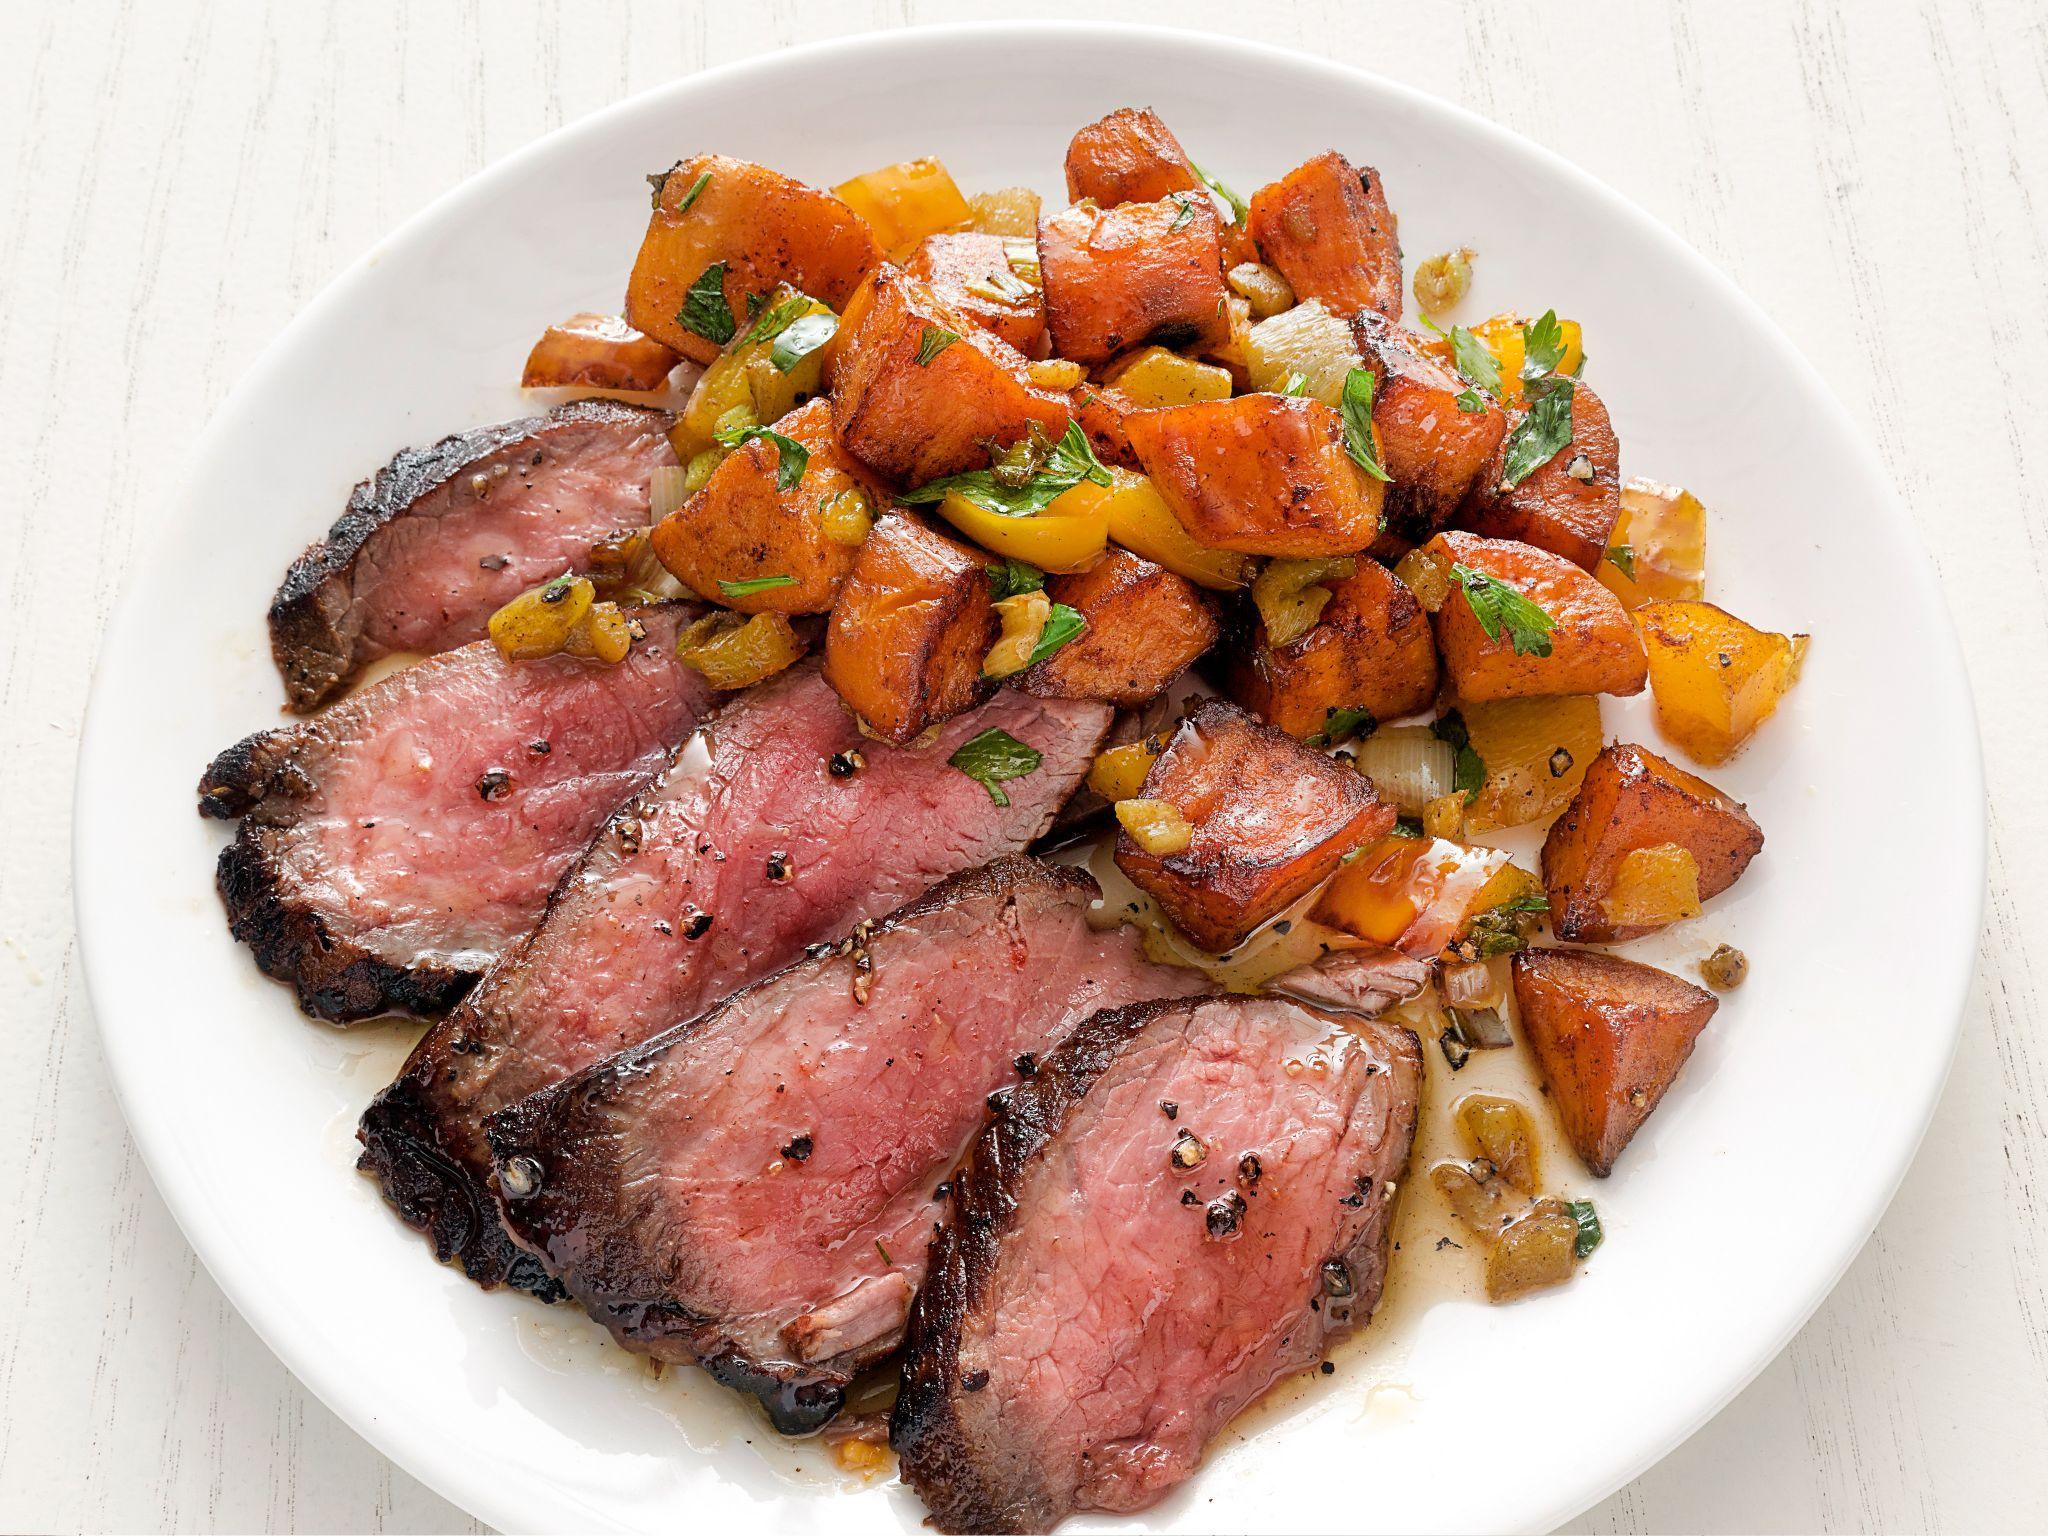 Steak with sweet potato hash recipe potato hash recipe hash meals forumfinder Choice Image